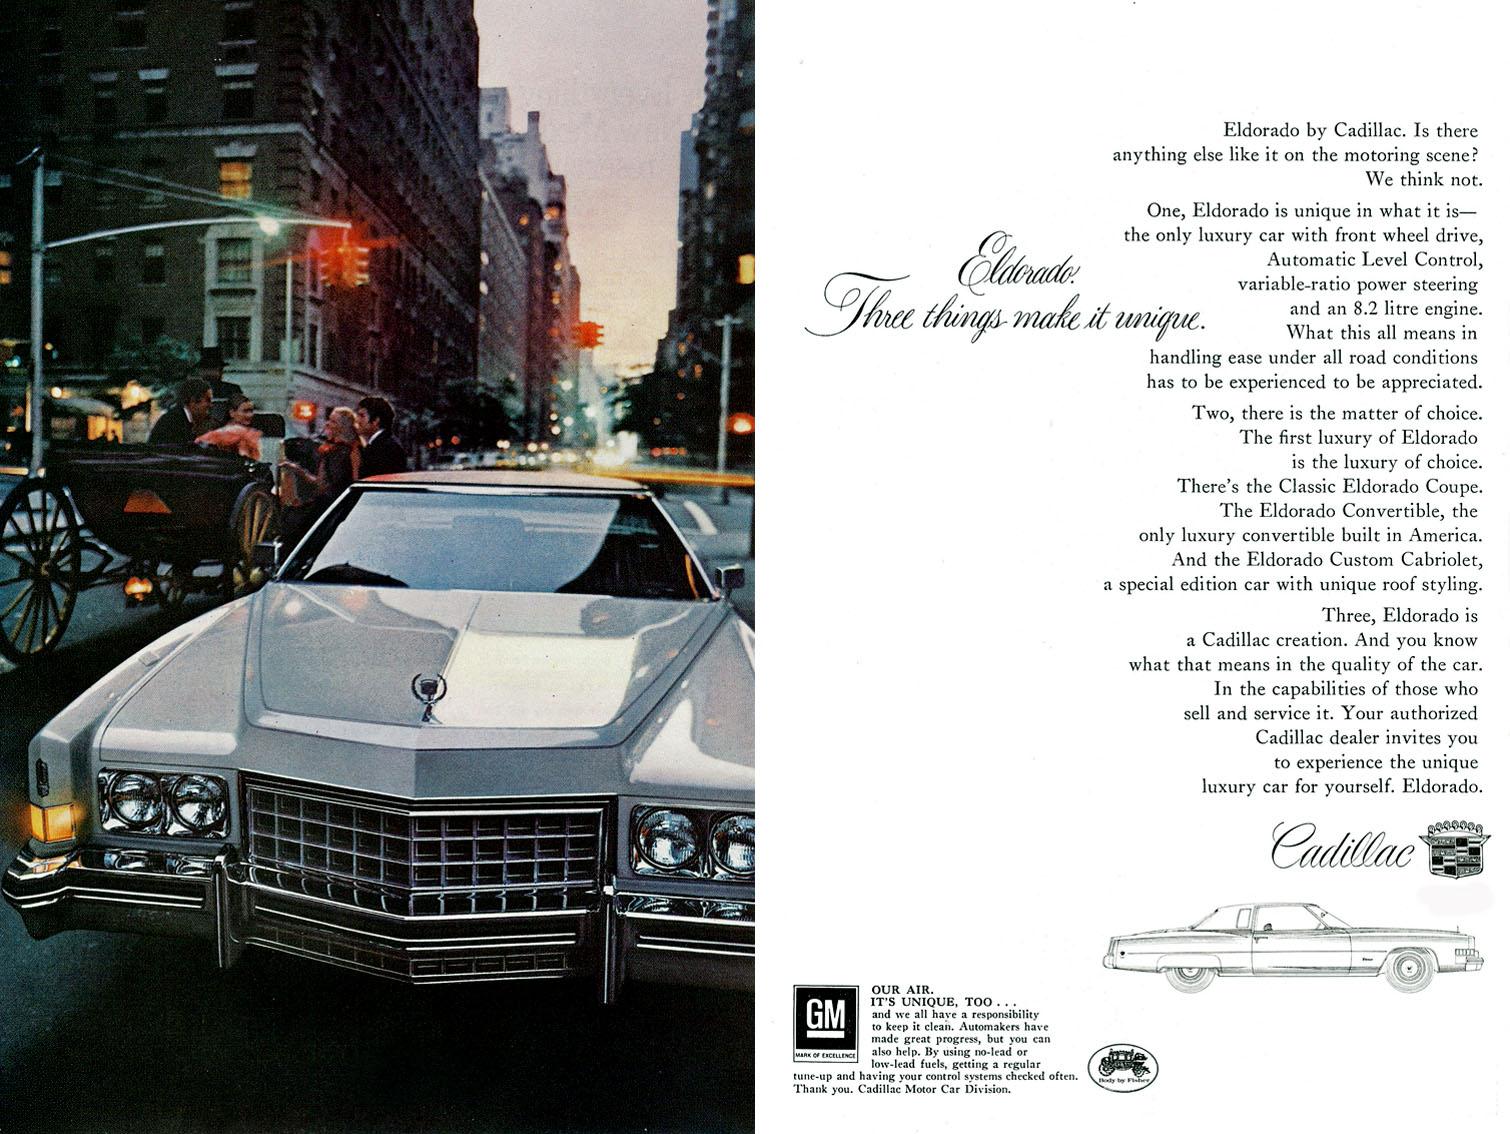 TunnelRam_Cadillac (41).jpg